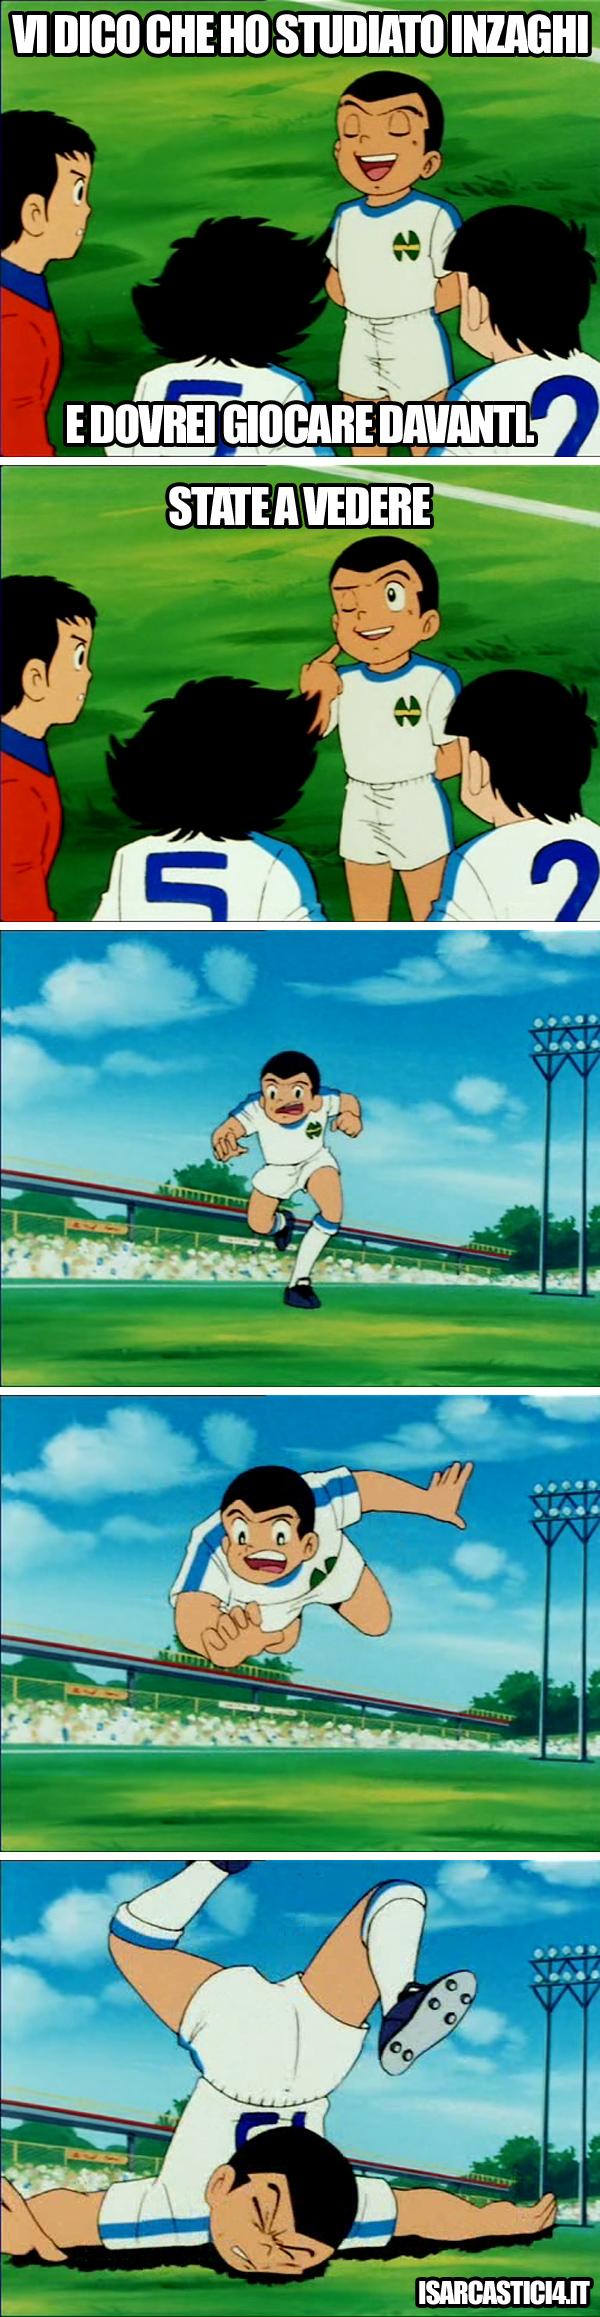 Holly & Benji, Capitan Tsubasa meme ita - Giallo